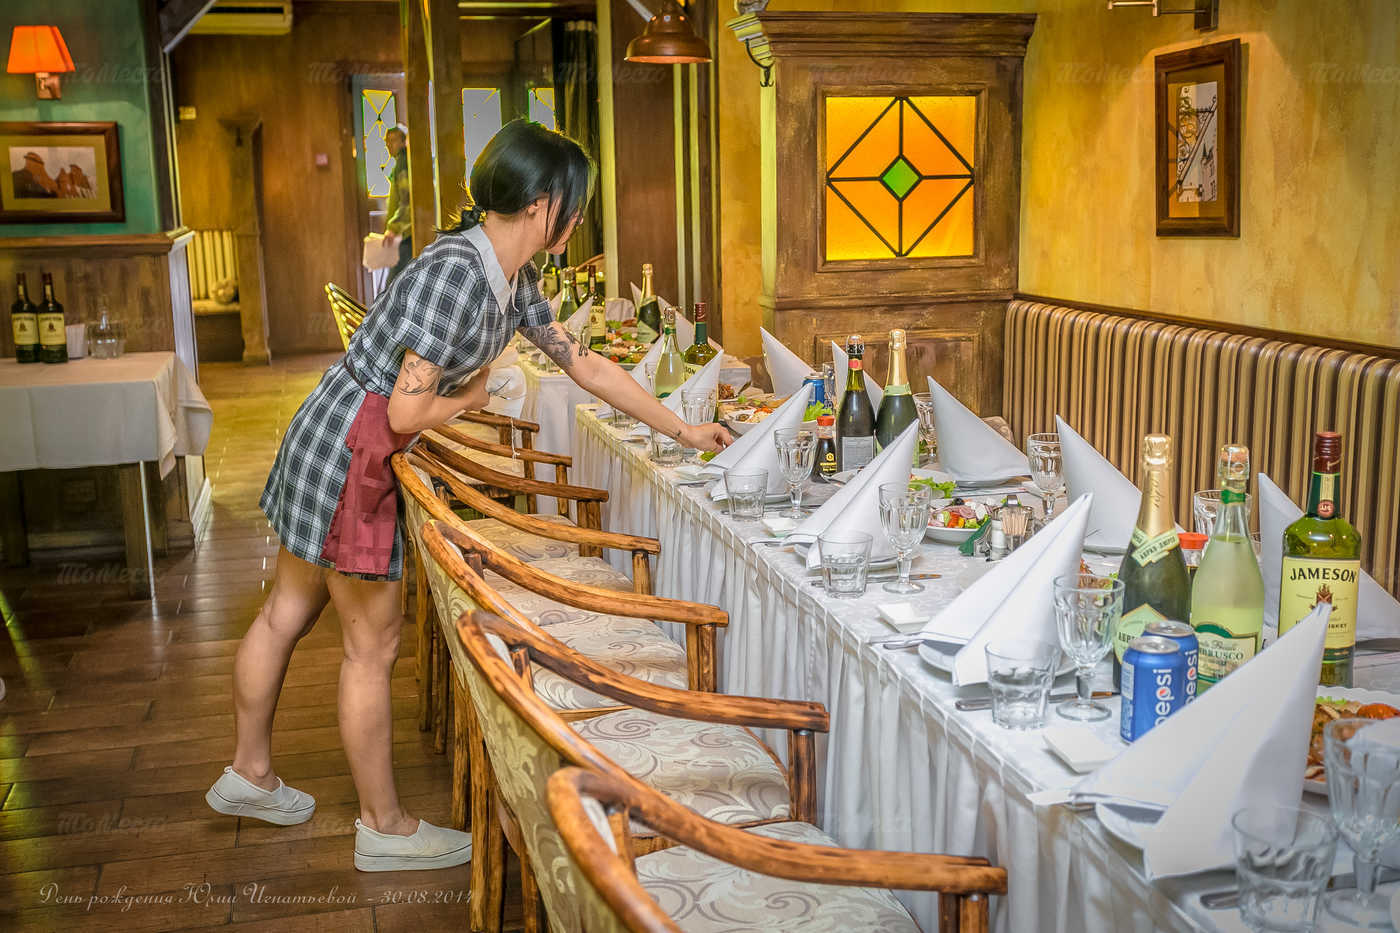 Меню ресторана Максим (MAKSIM) на Комендантском проспекте